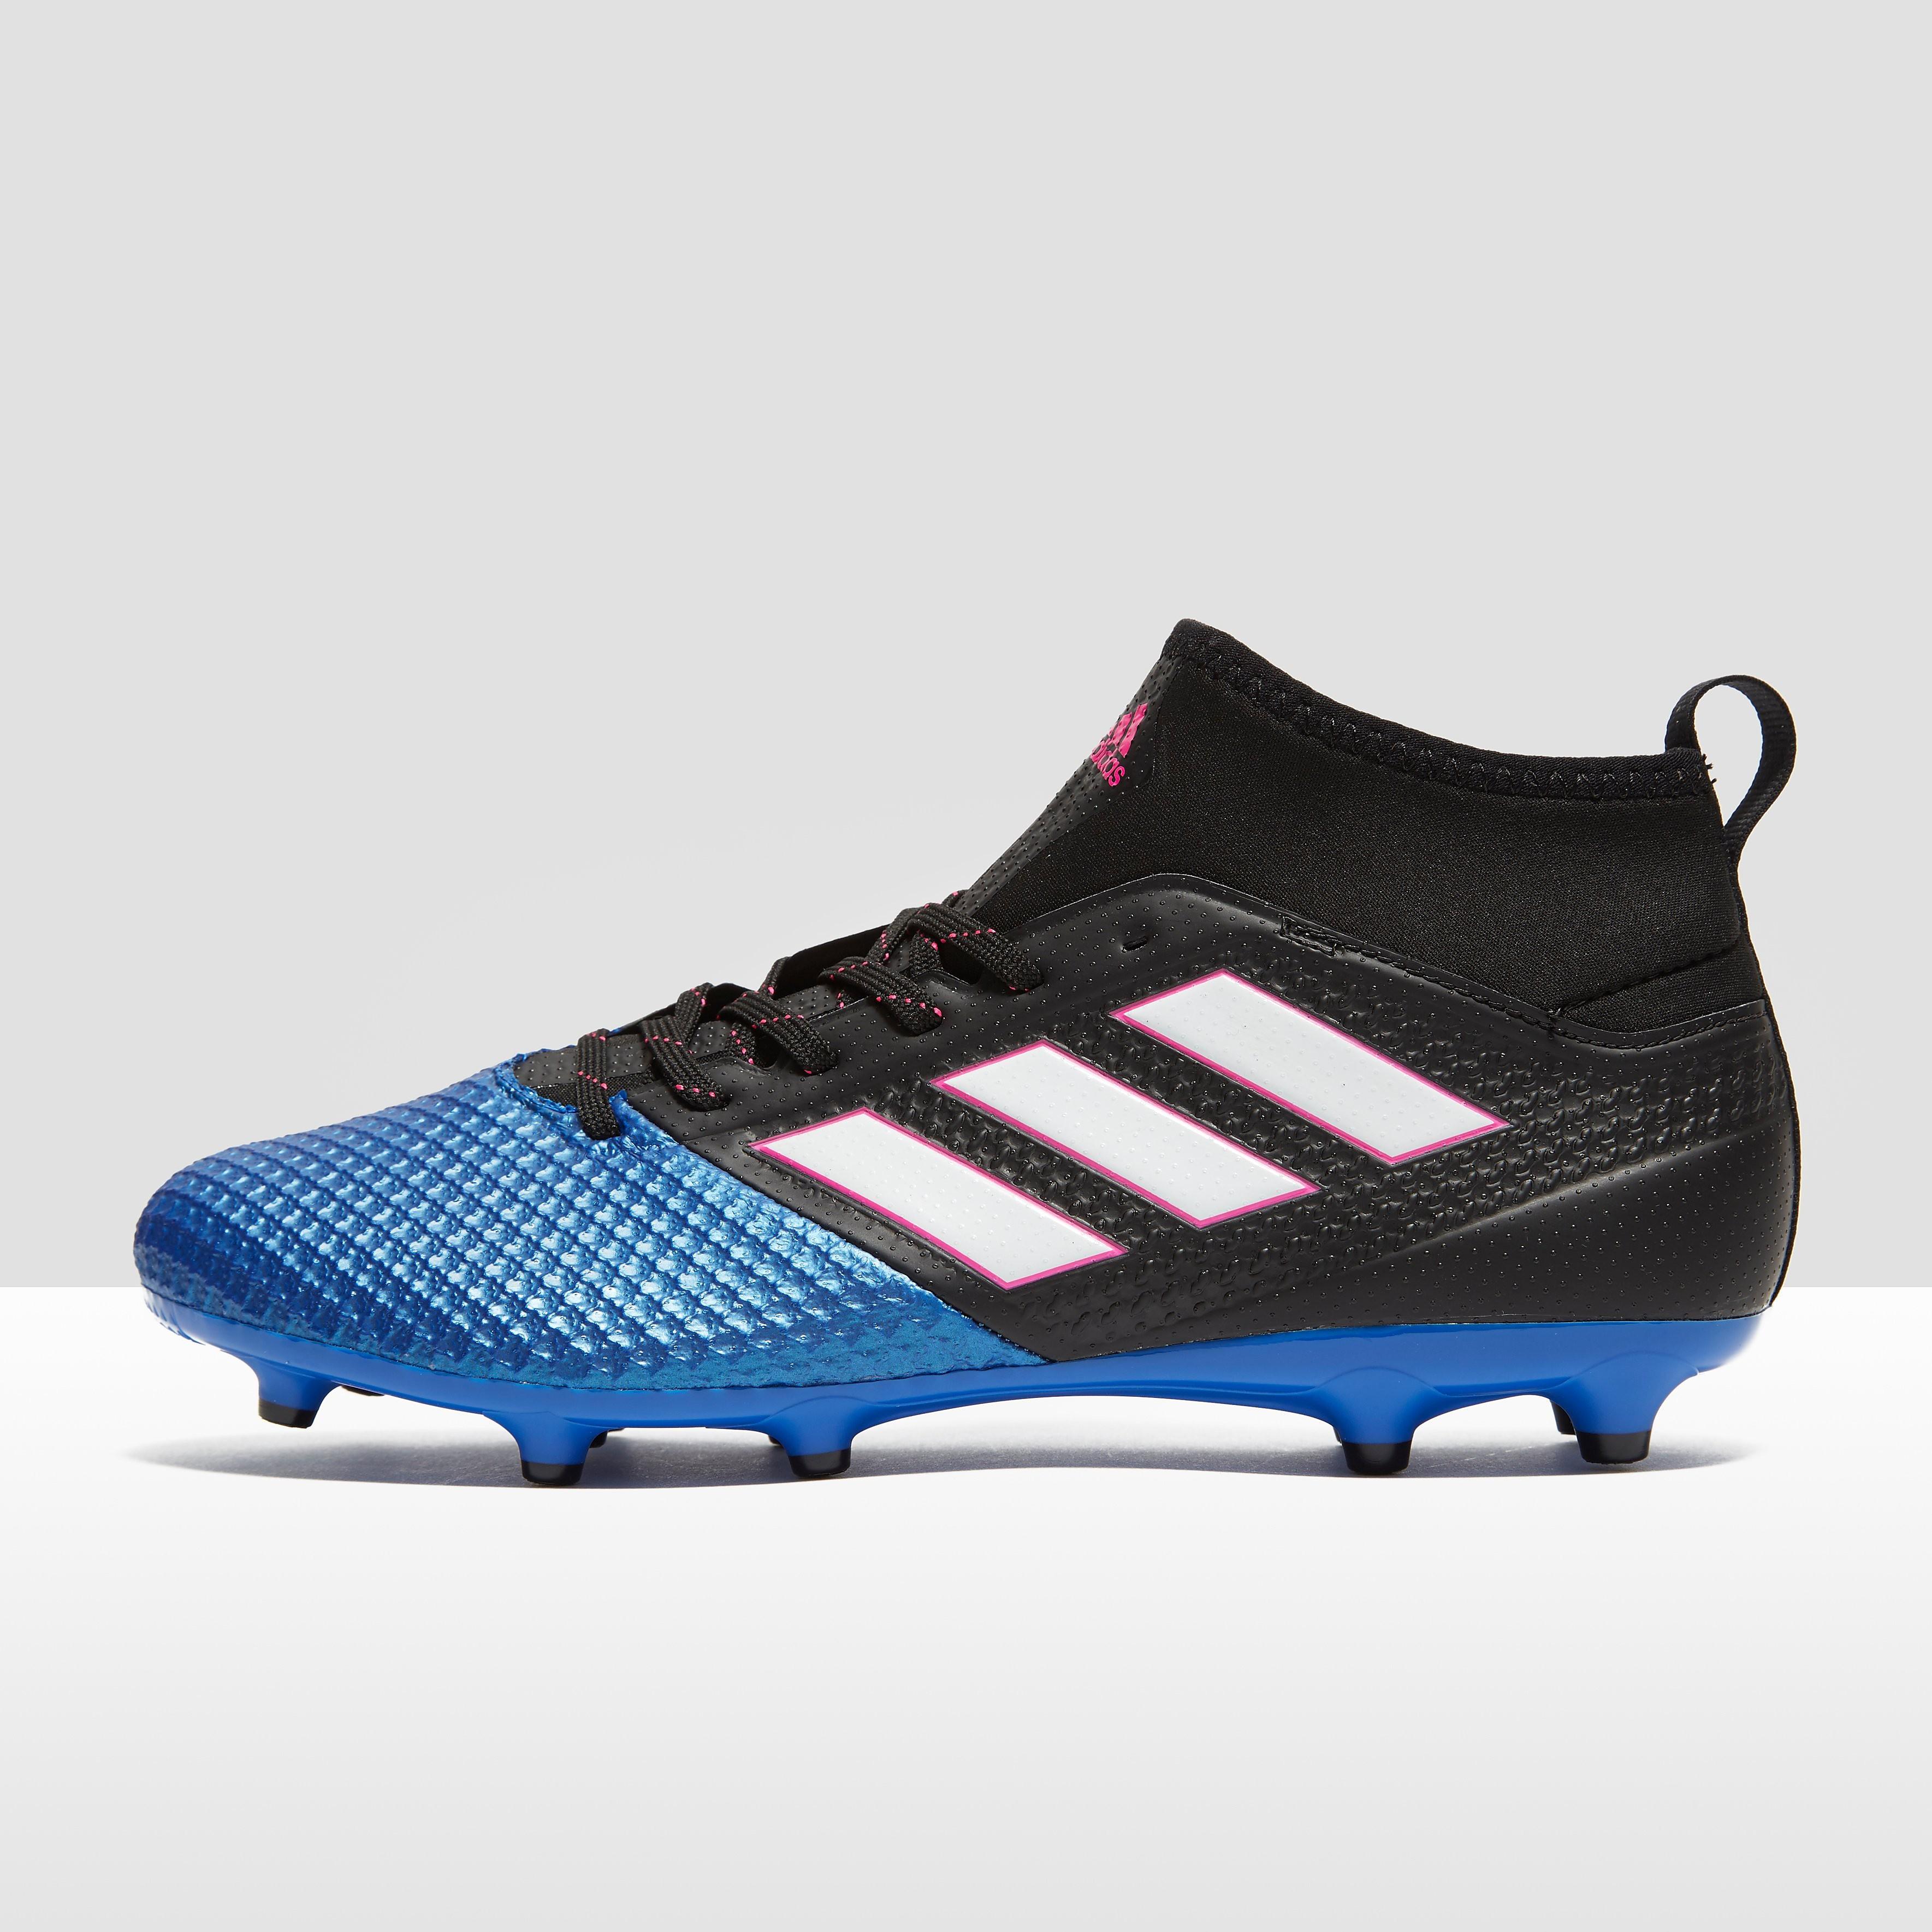 adidas Blue Blast ACE 17.3 Primemesh Firm Ground Football Boots